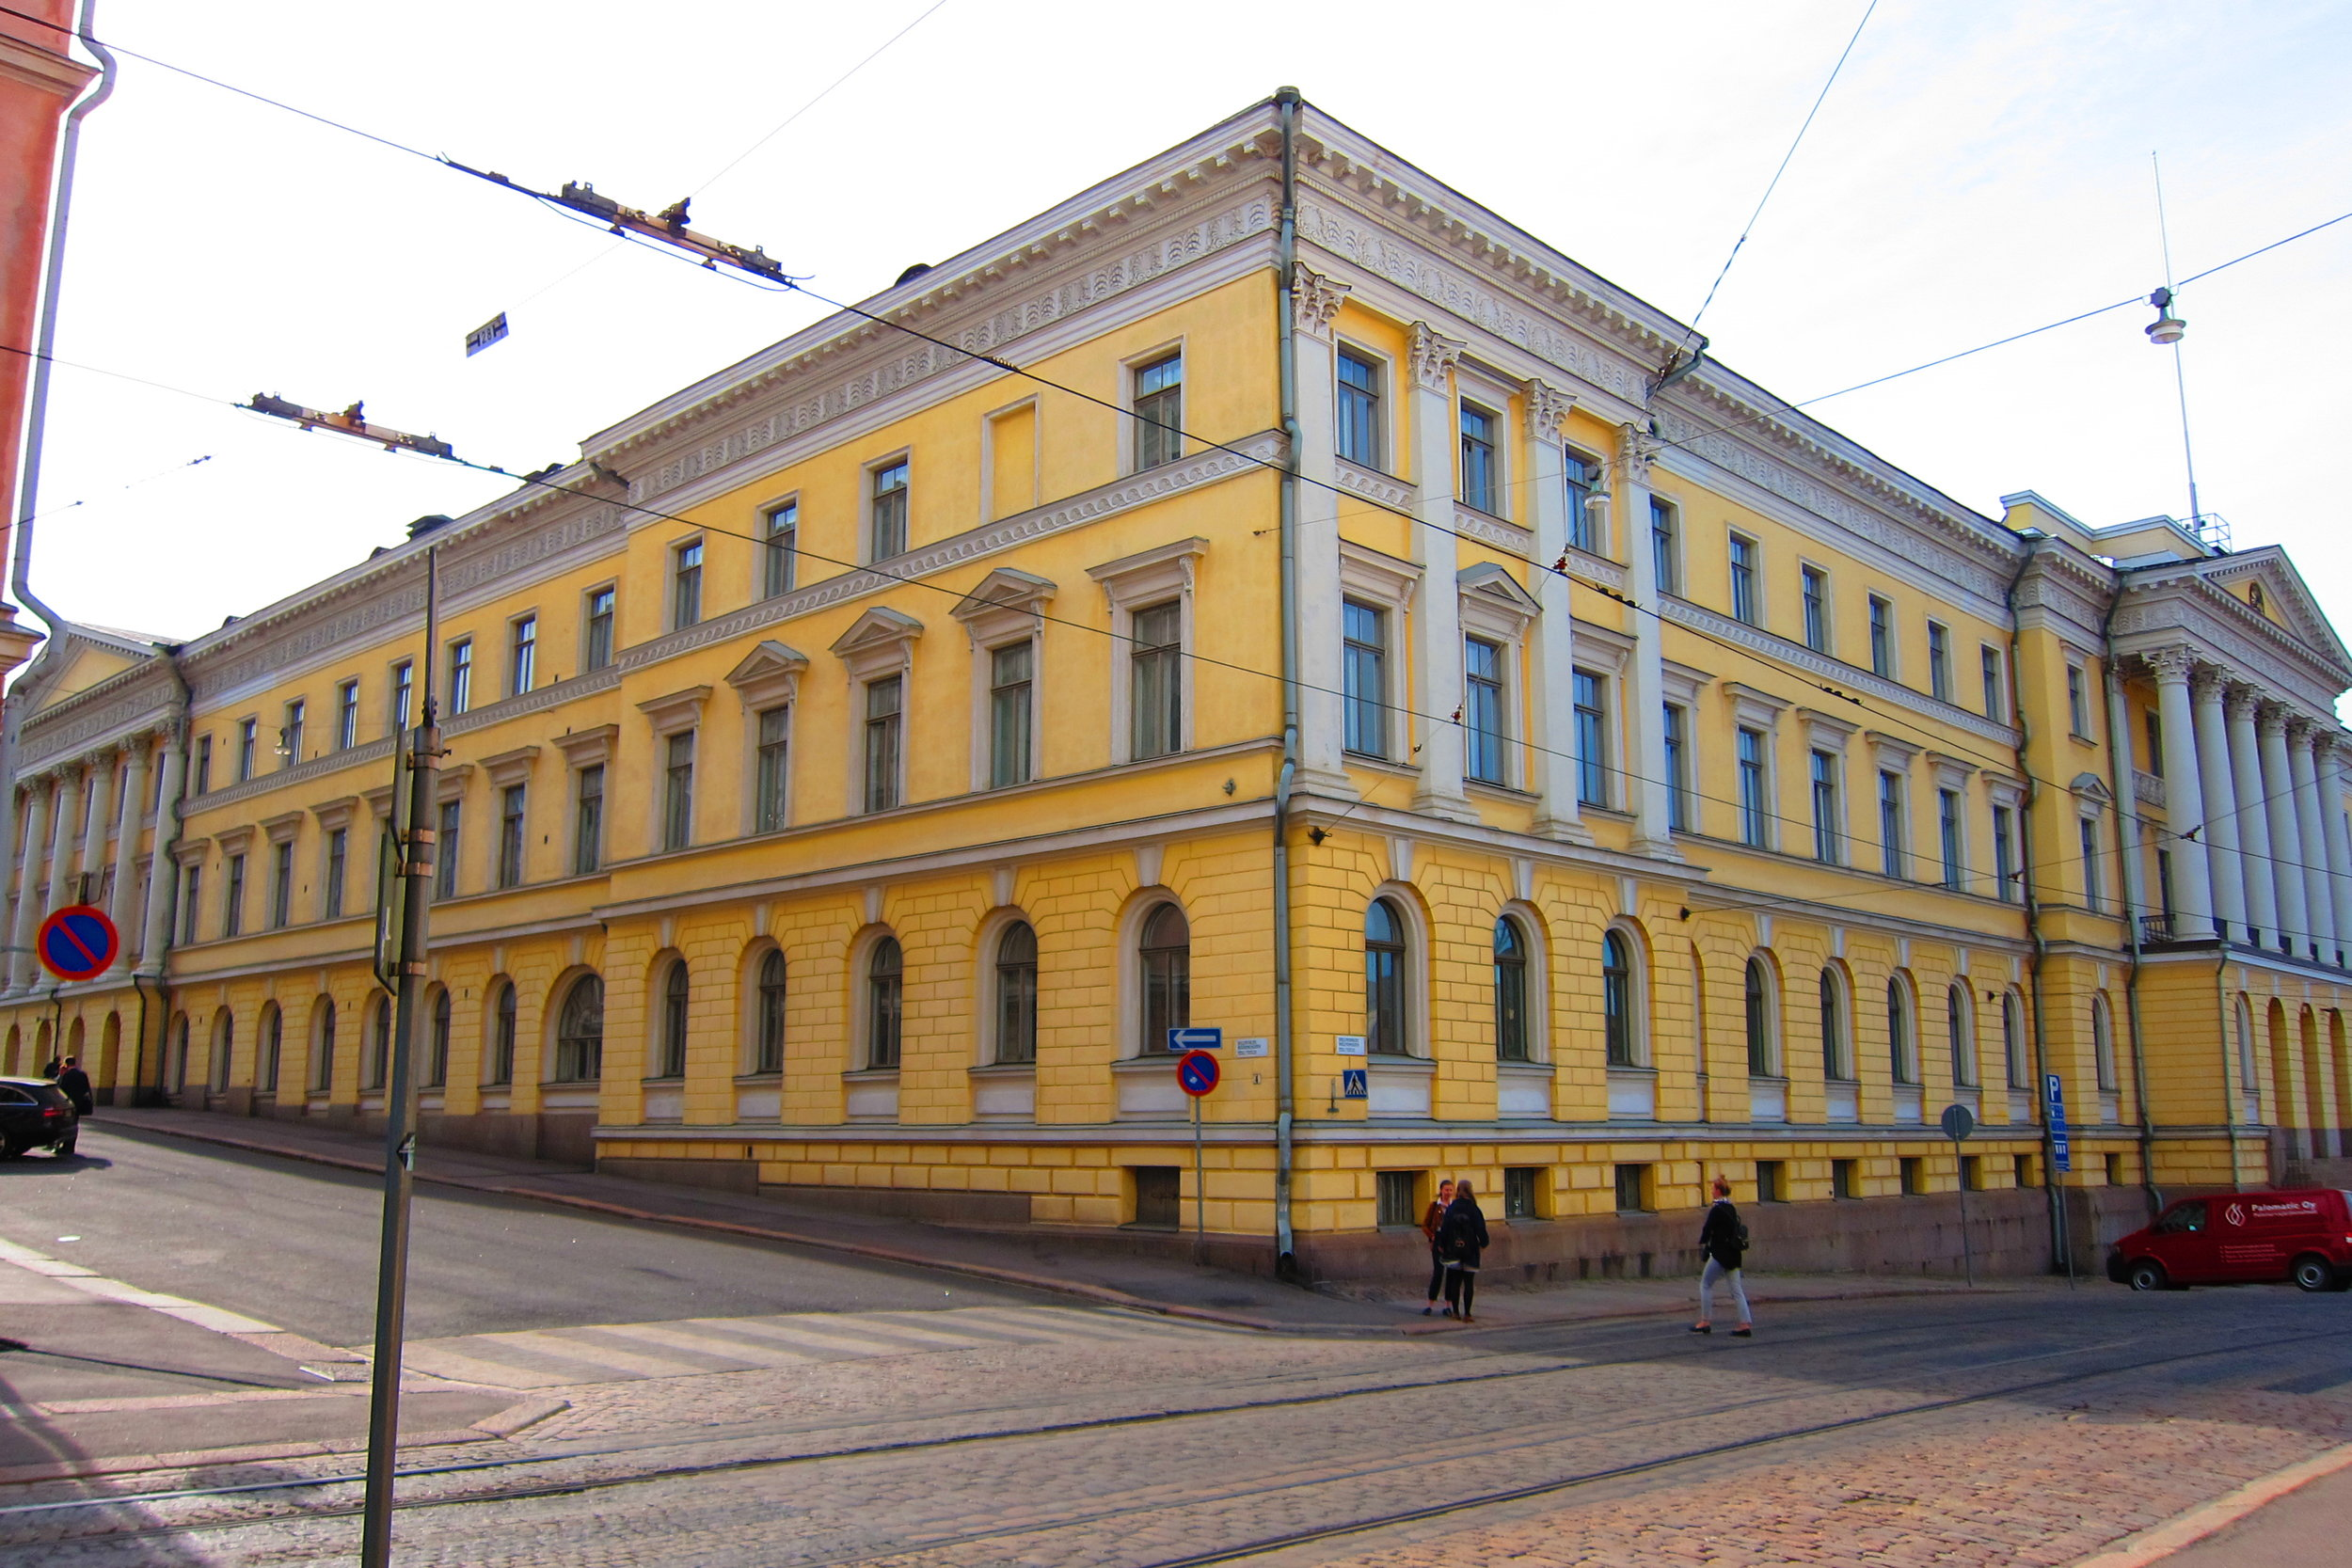 Helsinki, Day 1 (5/19/19)